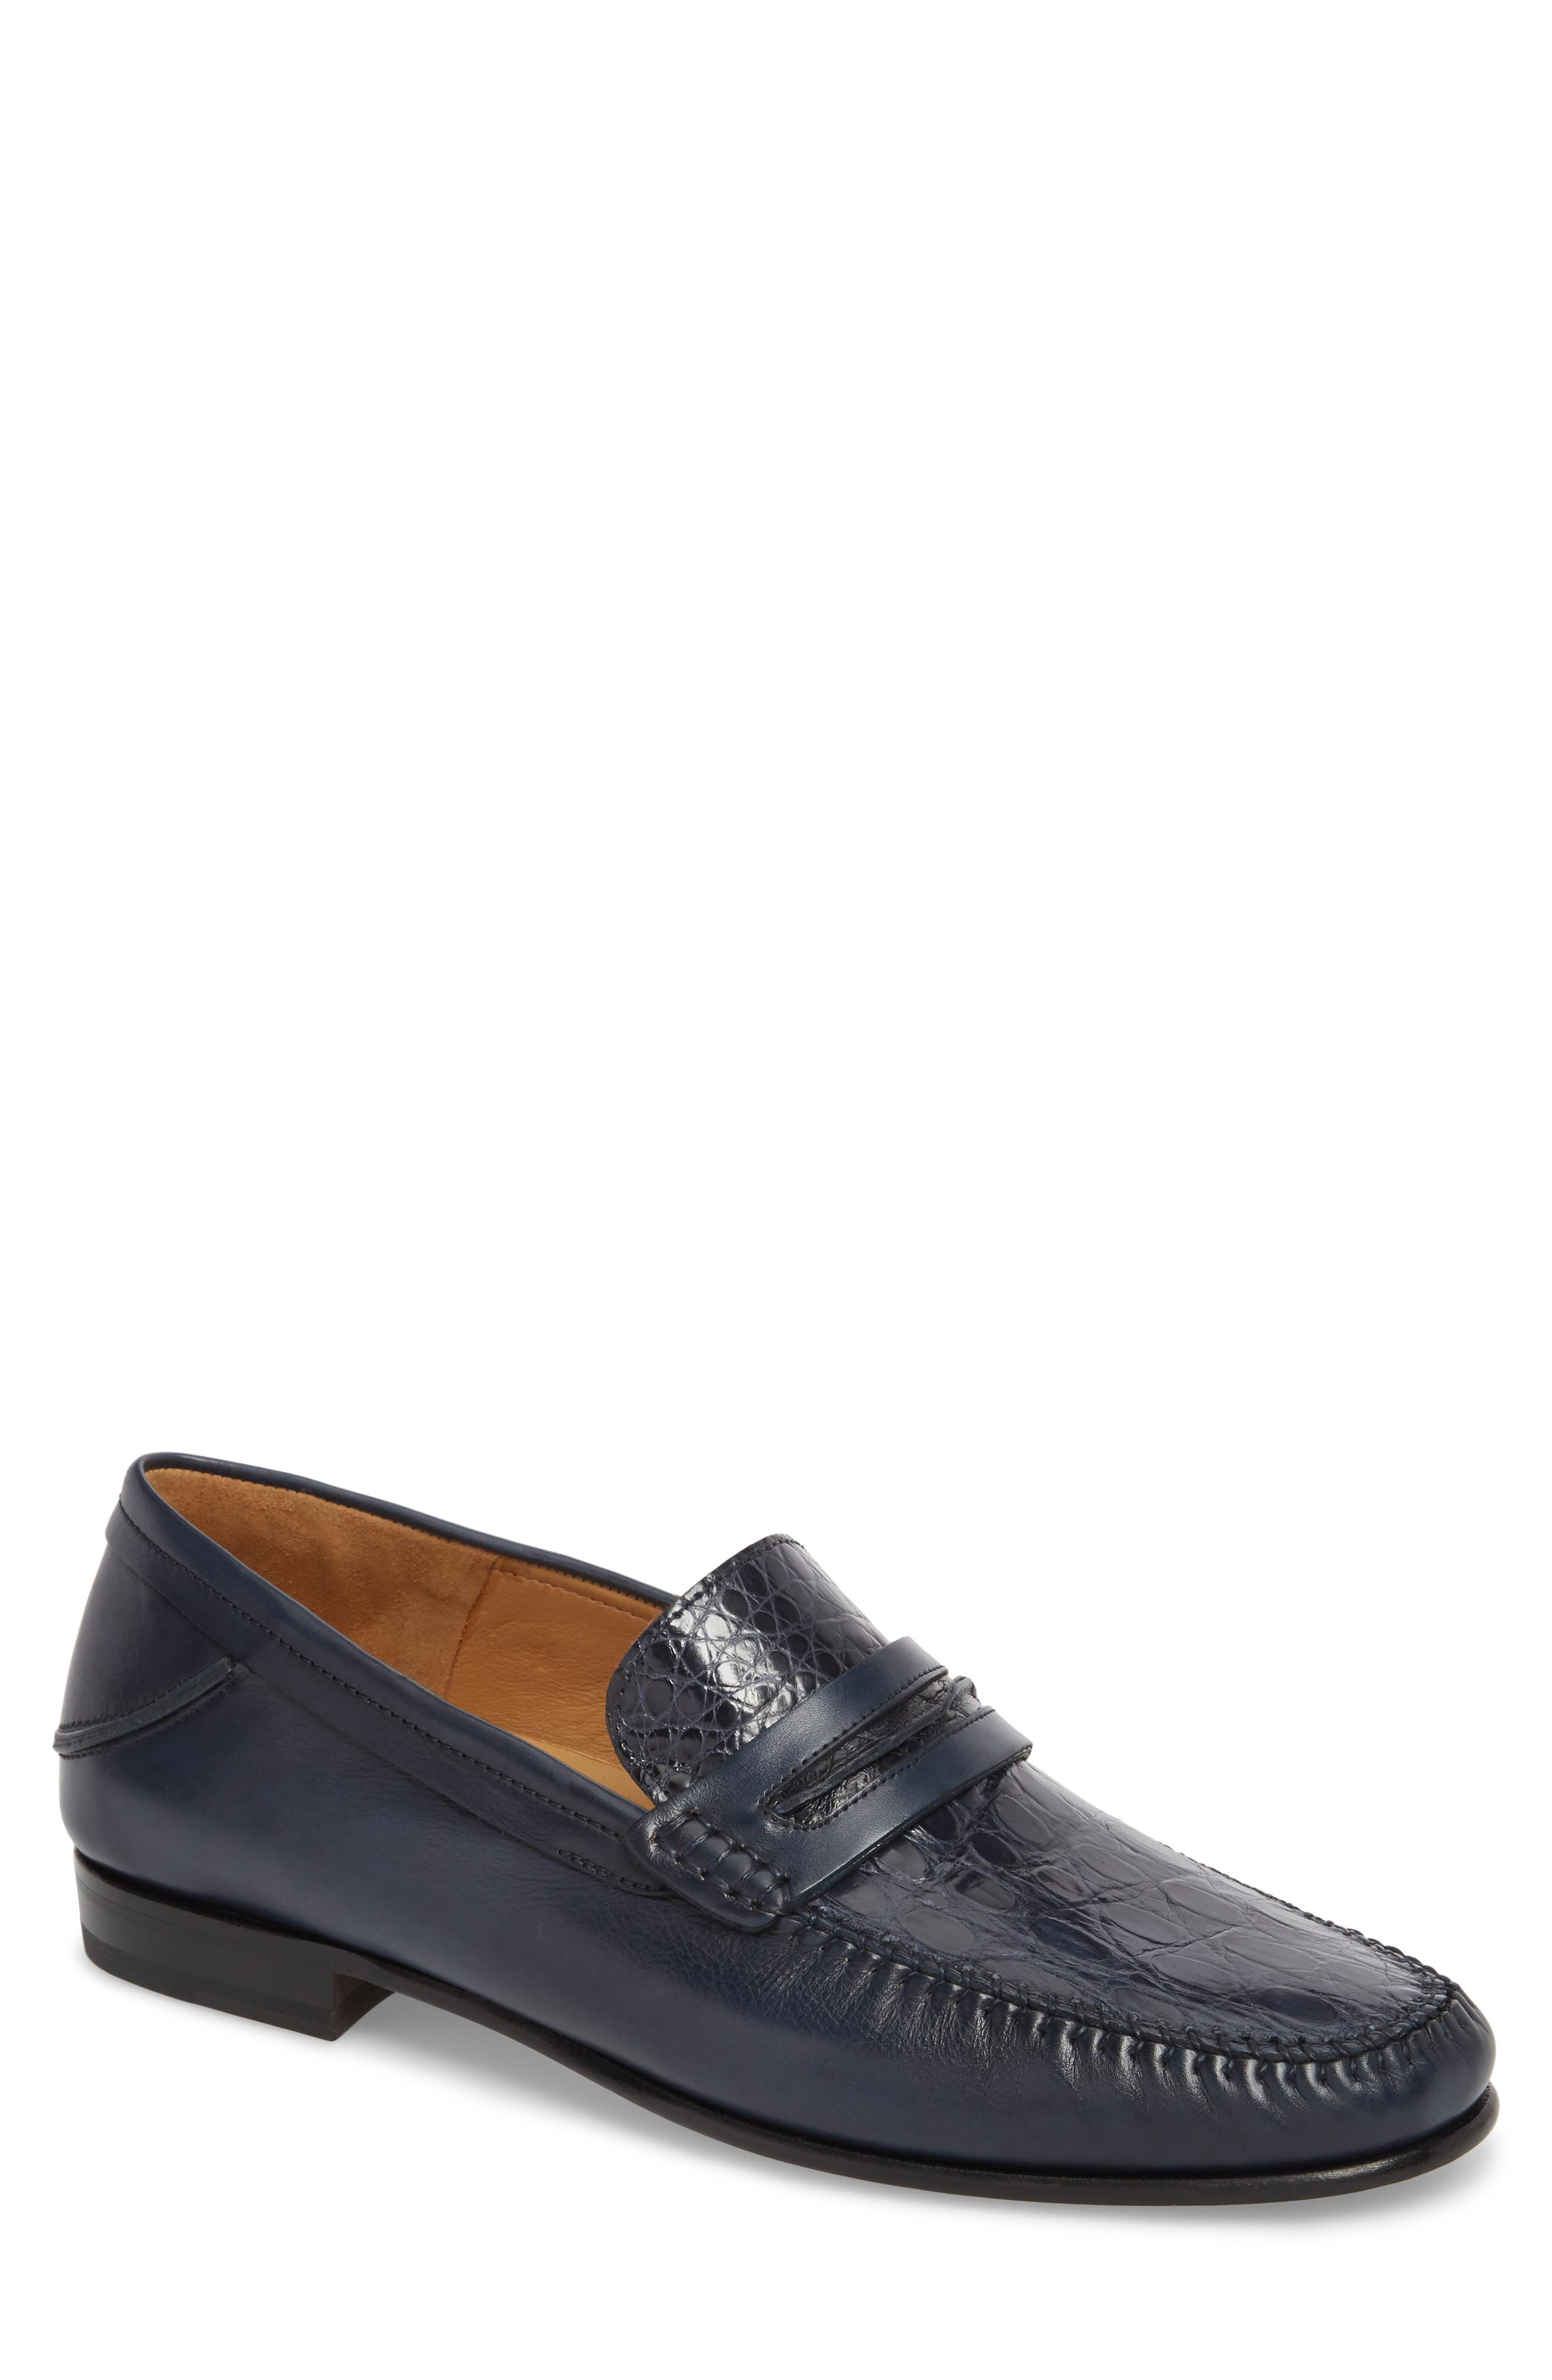 Kronos Moc Toe Penny Loafer,                         Main,                         color, Blue Leather